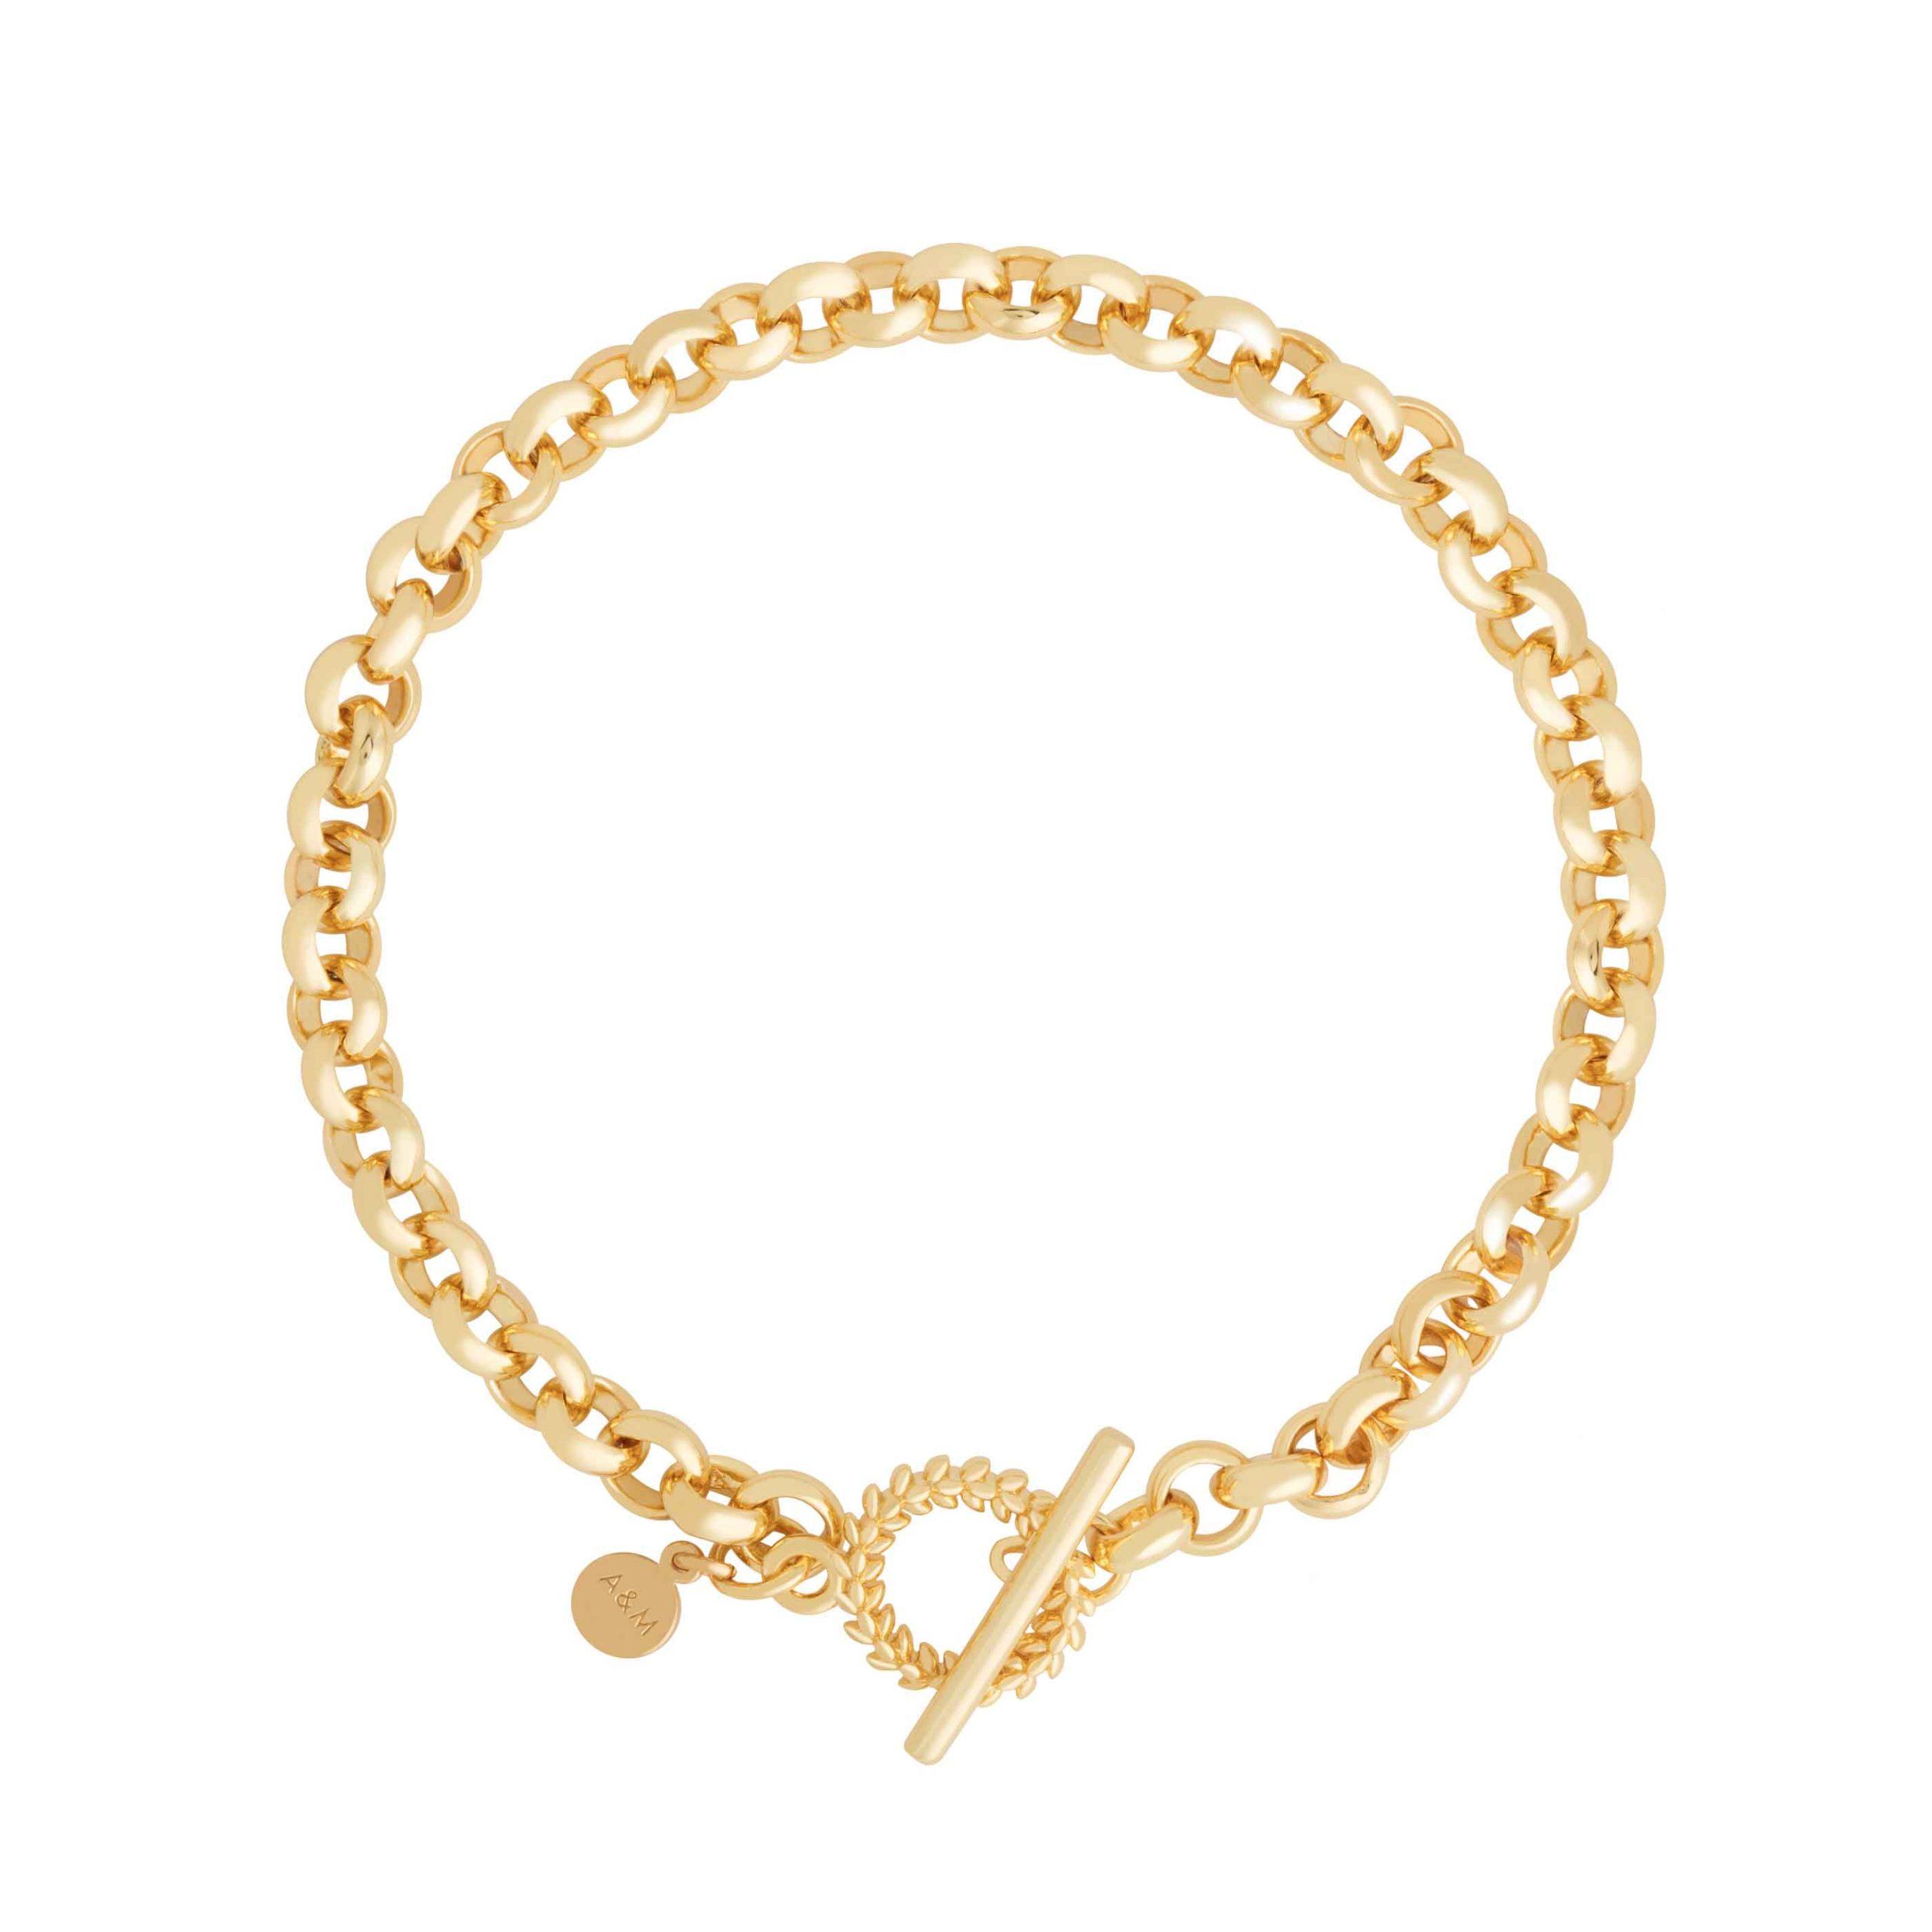 WREATH CHUNKY BRACELET GOLD